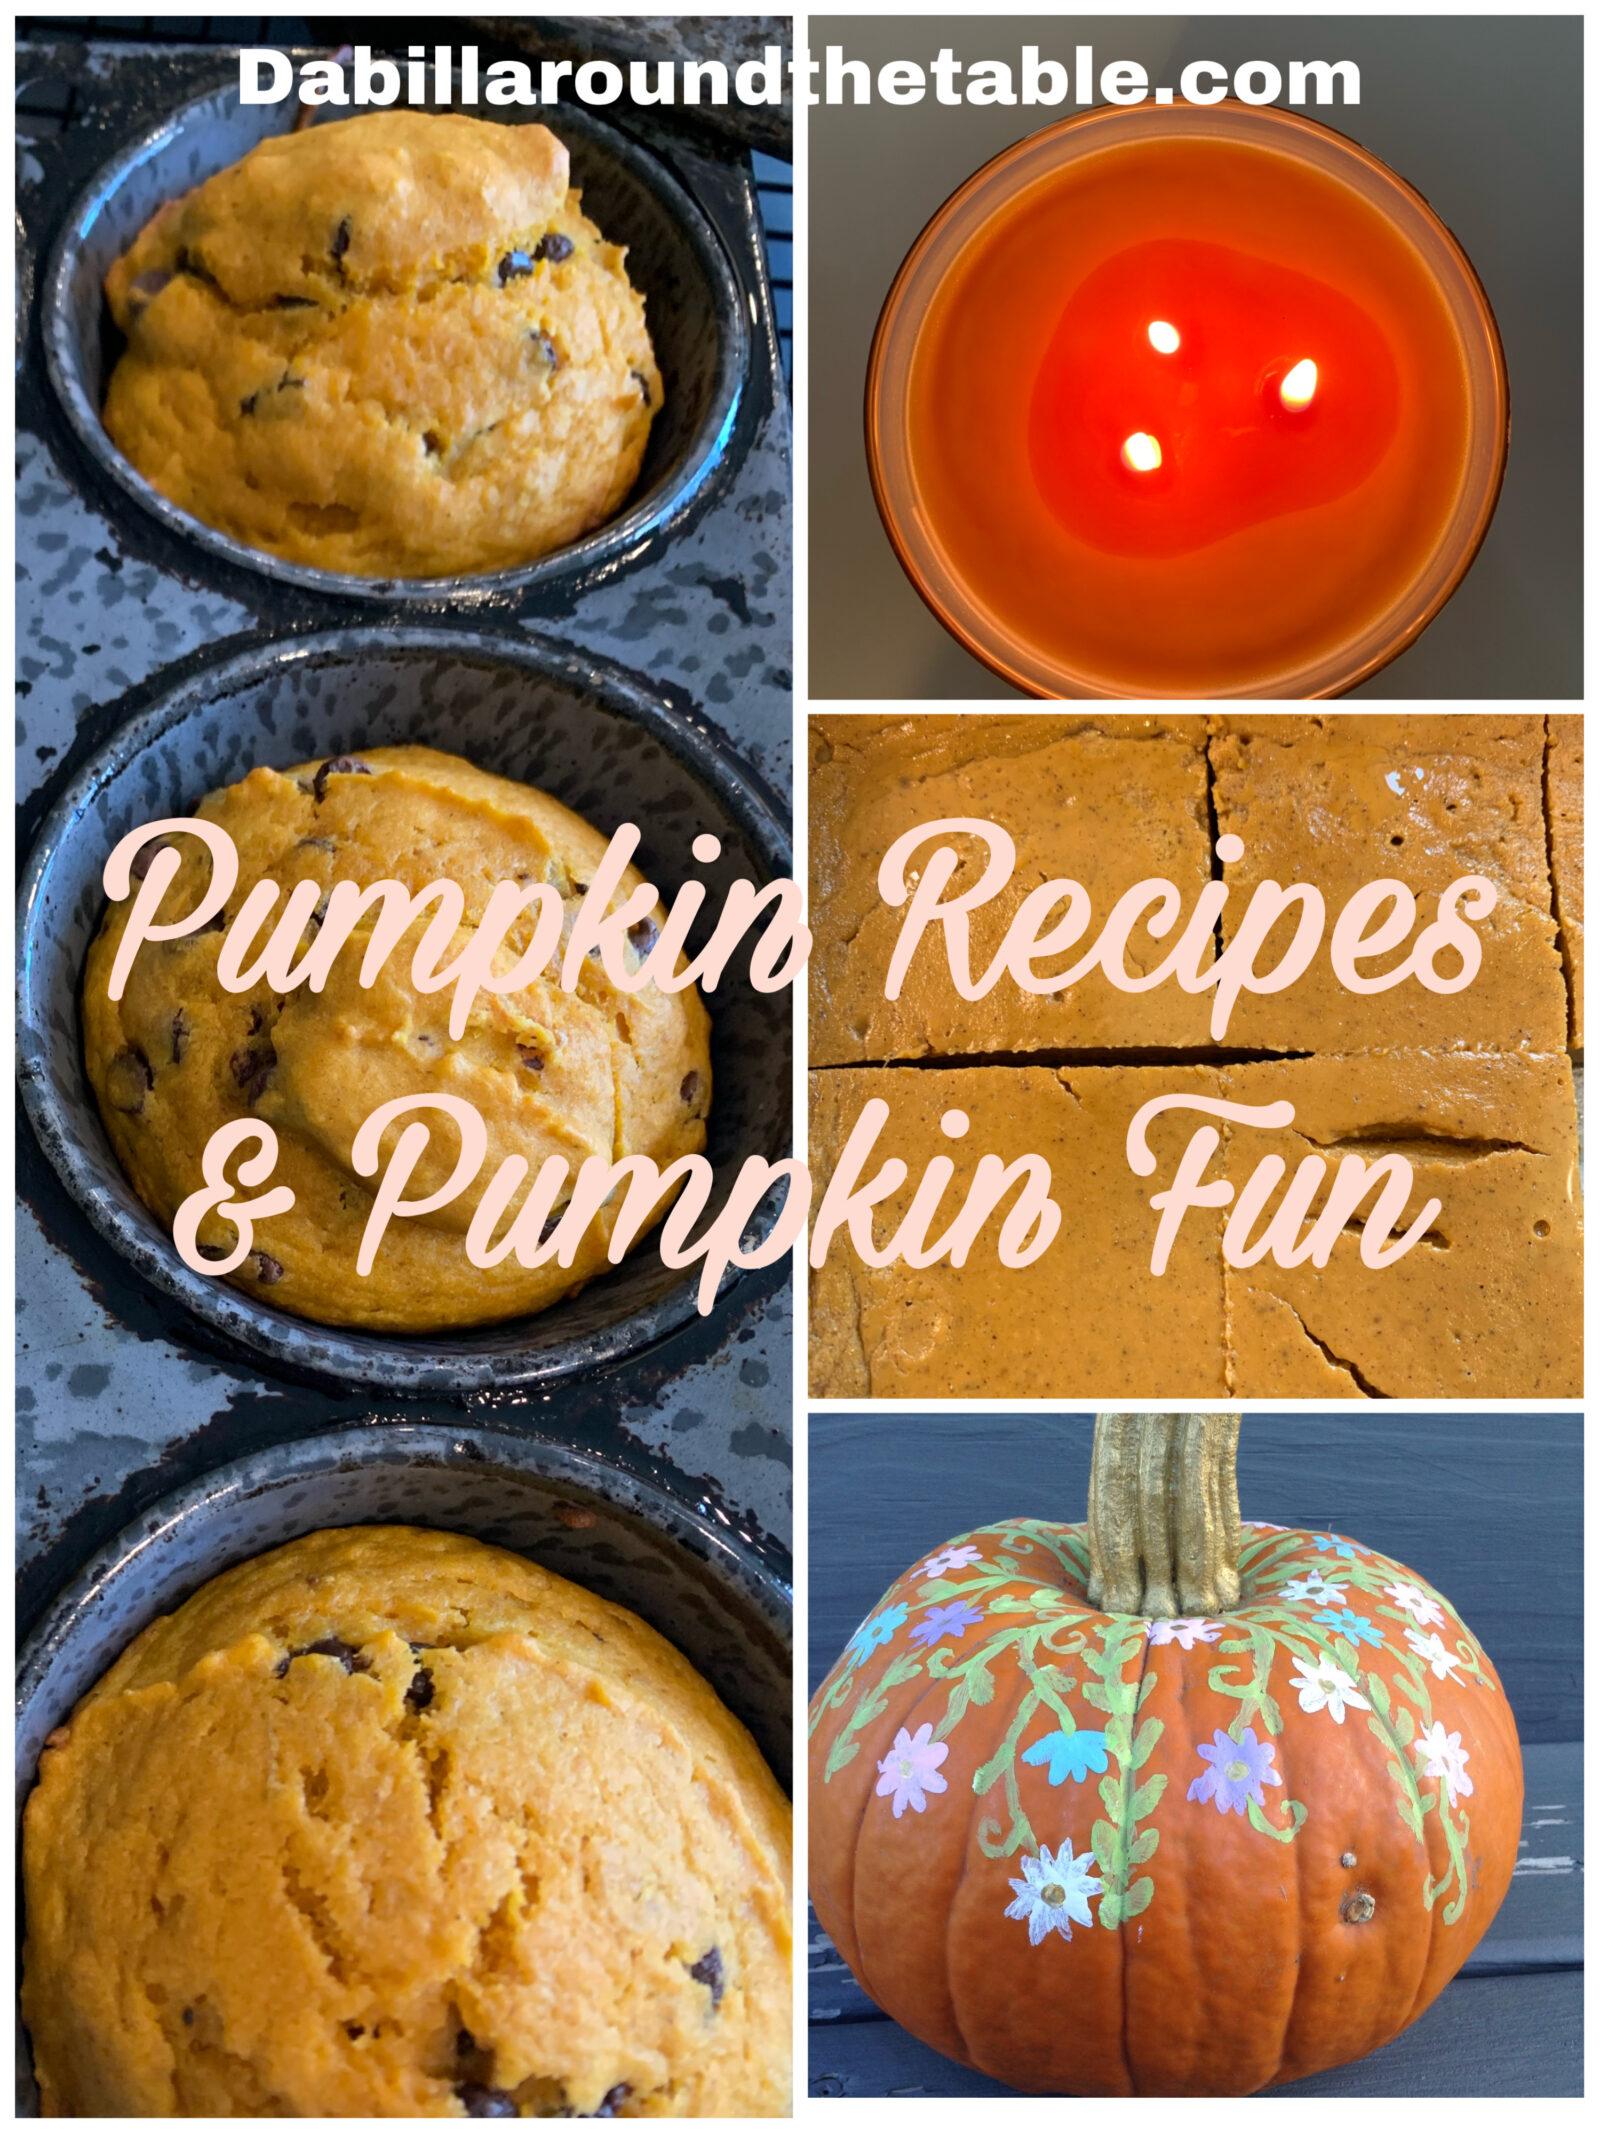 Pumpkin Recipes and Pumpkin Fun